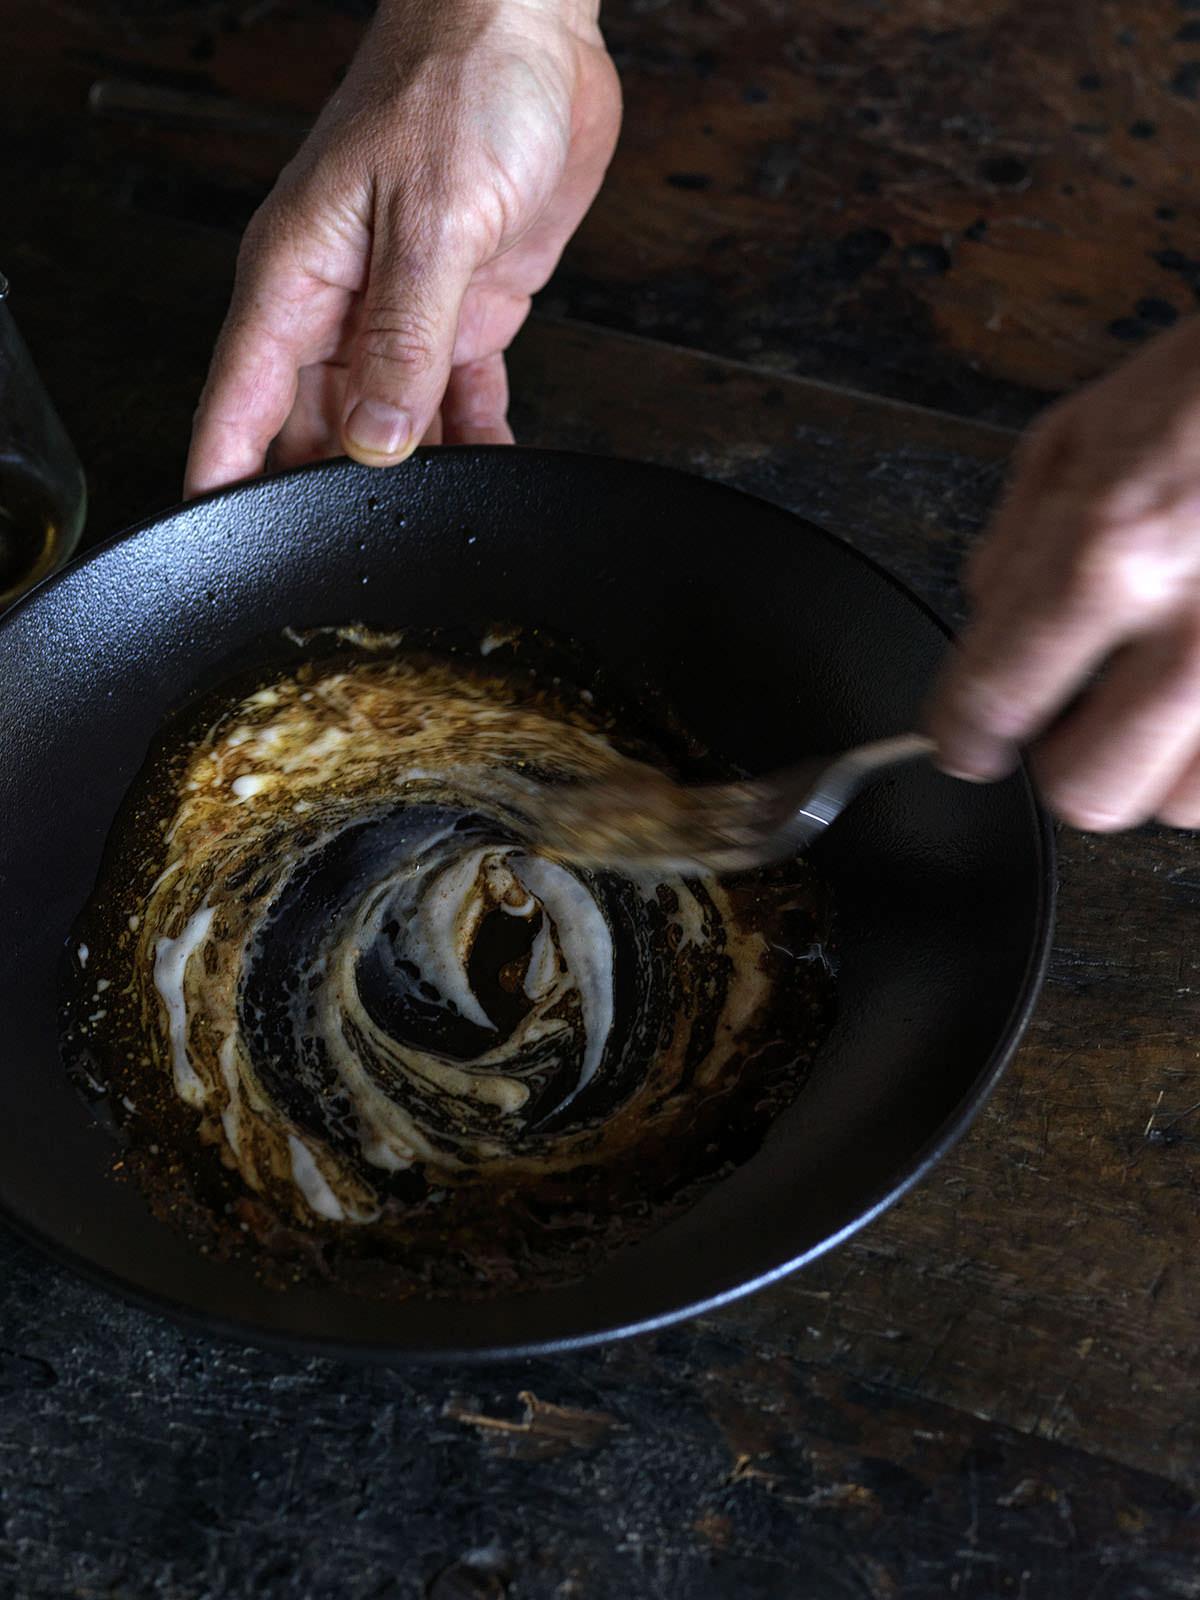 Shio Koji - a natural tenderiser for steak which also imparts rich umami flavour.